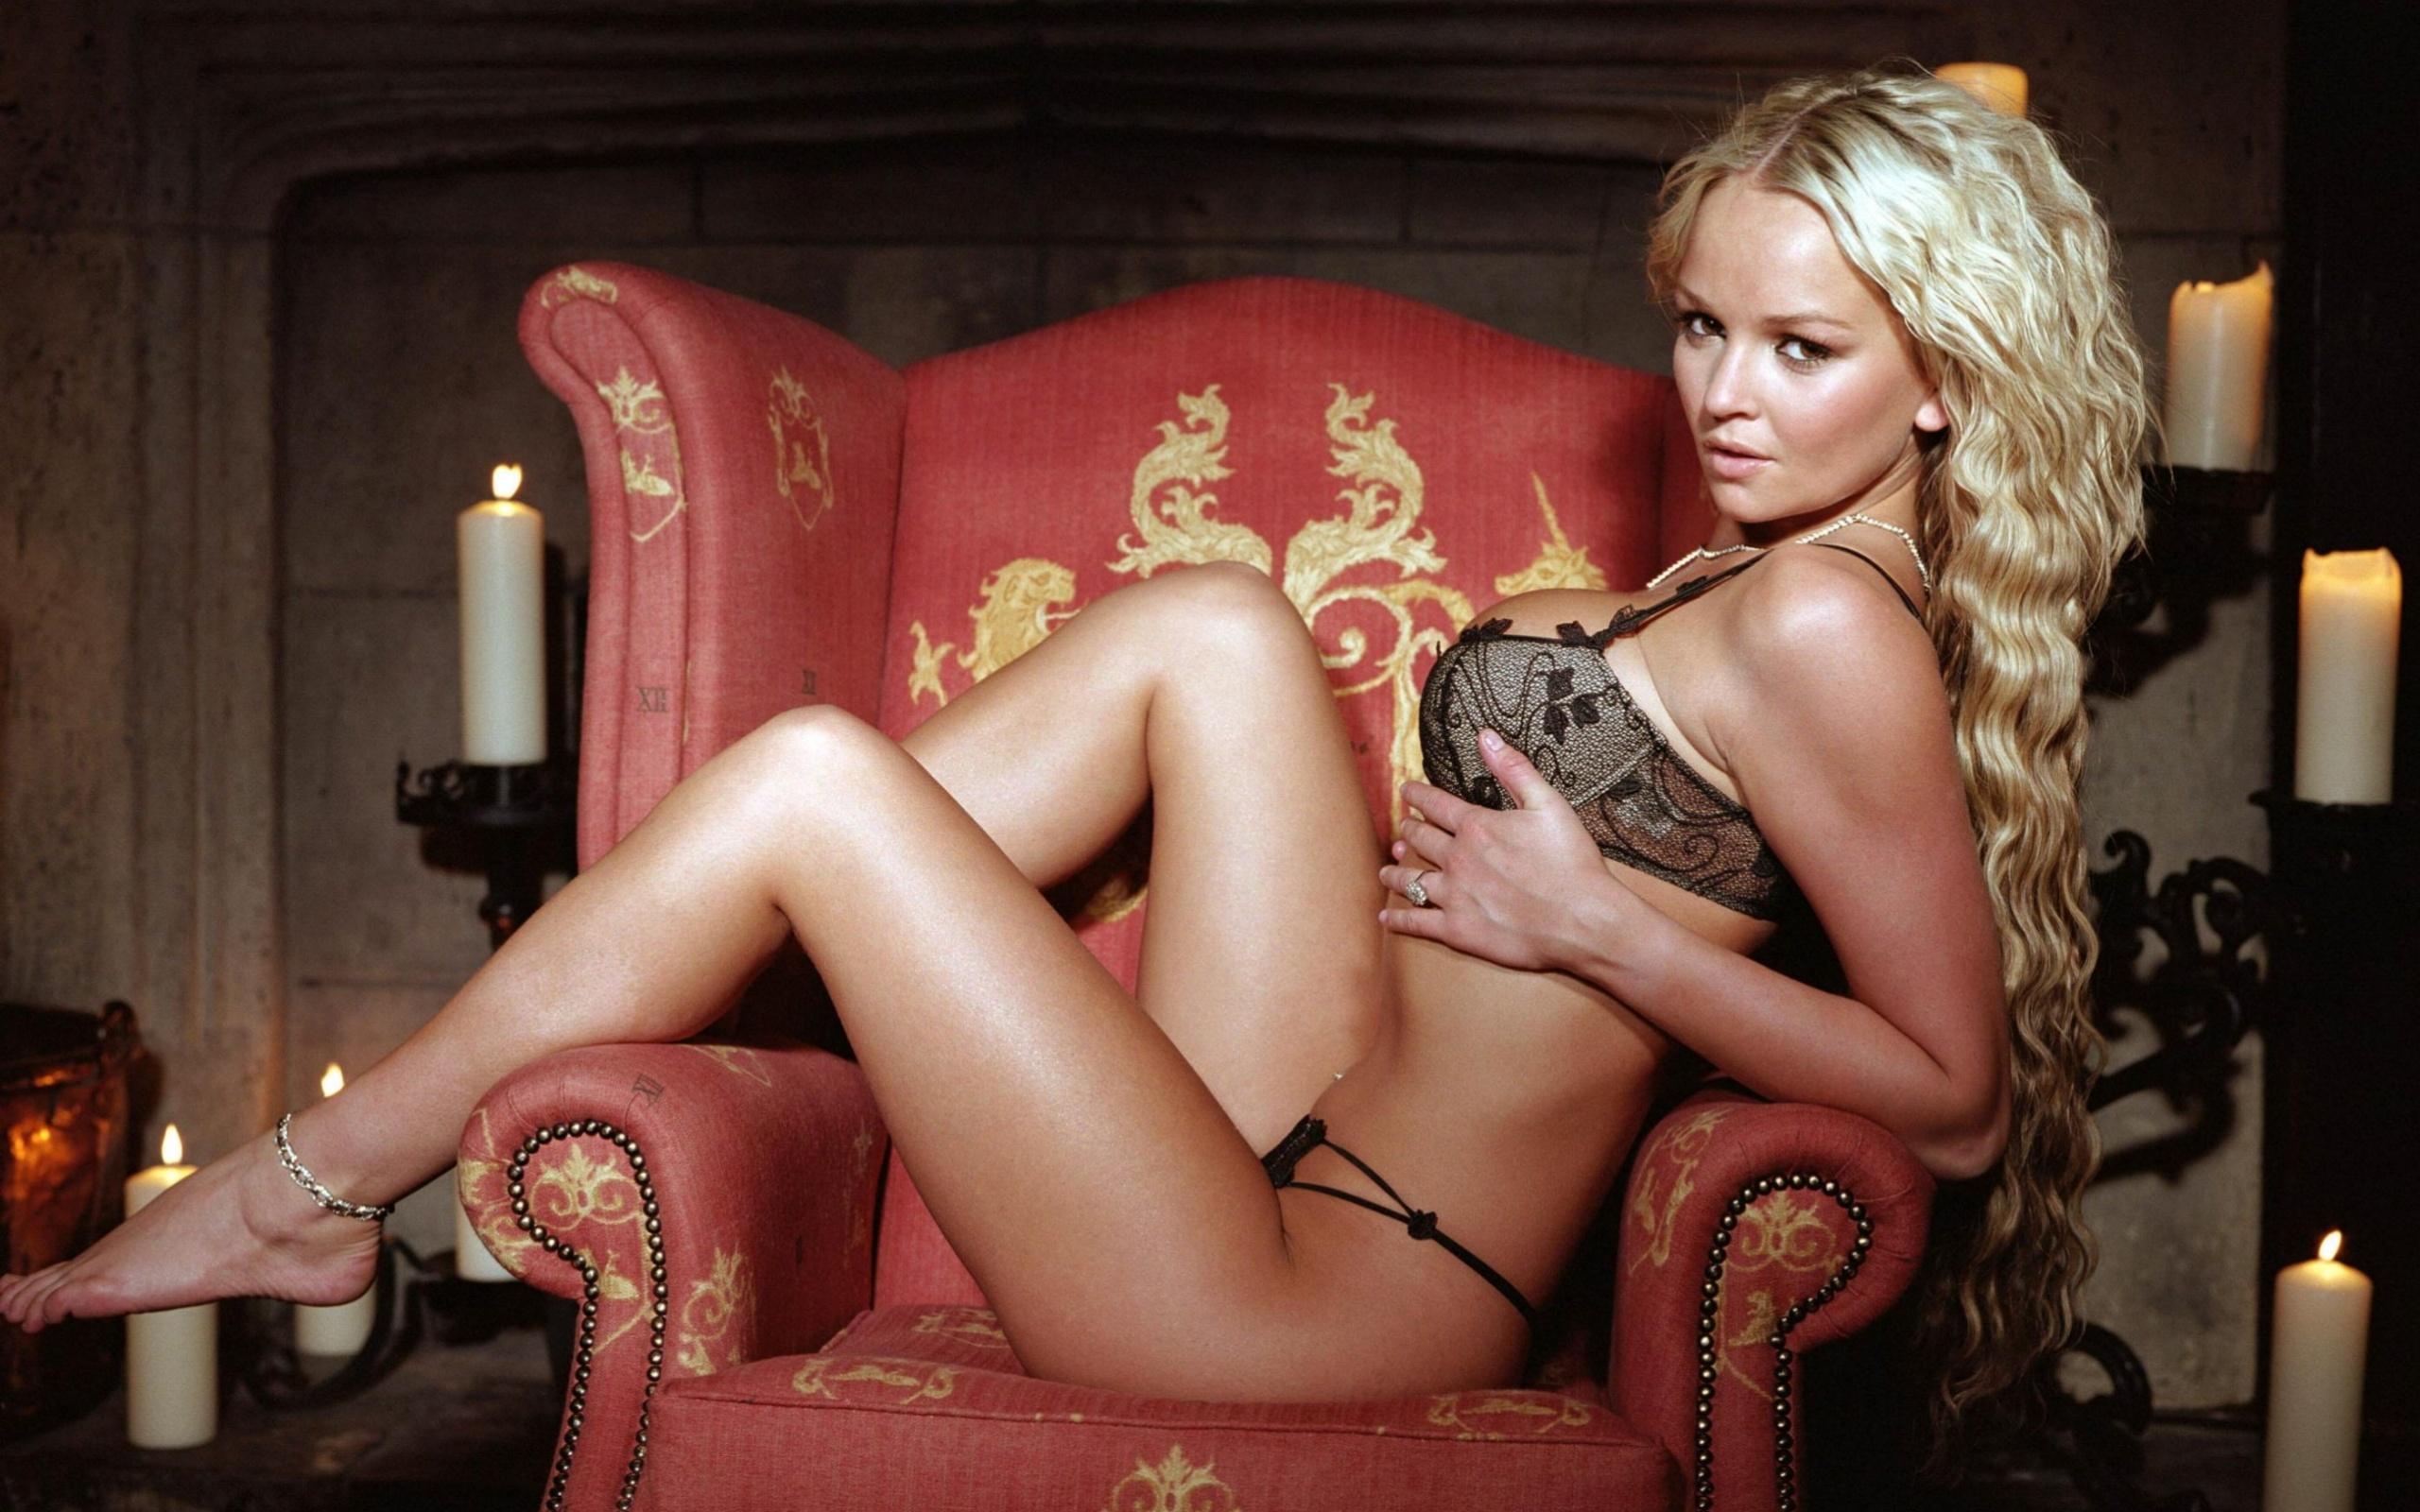 Share your Jennifer ellison sexy